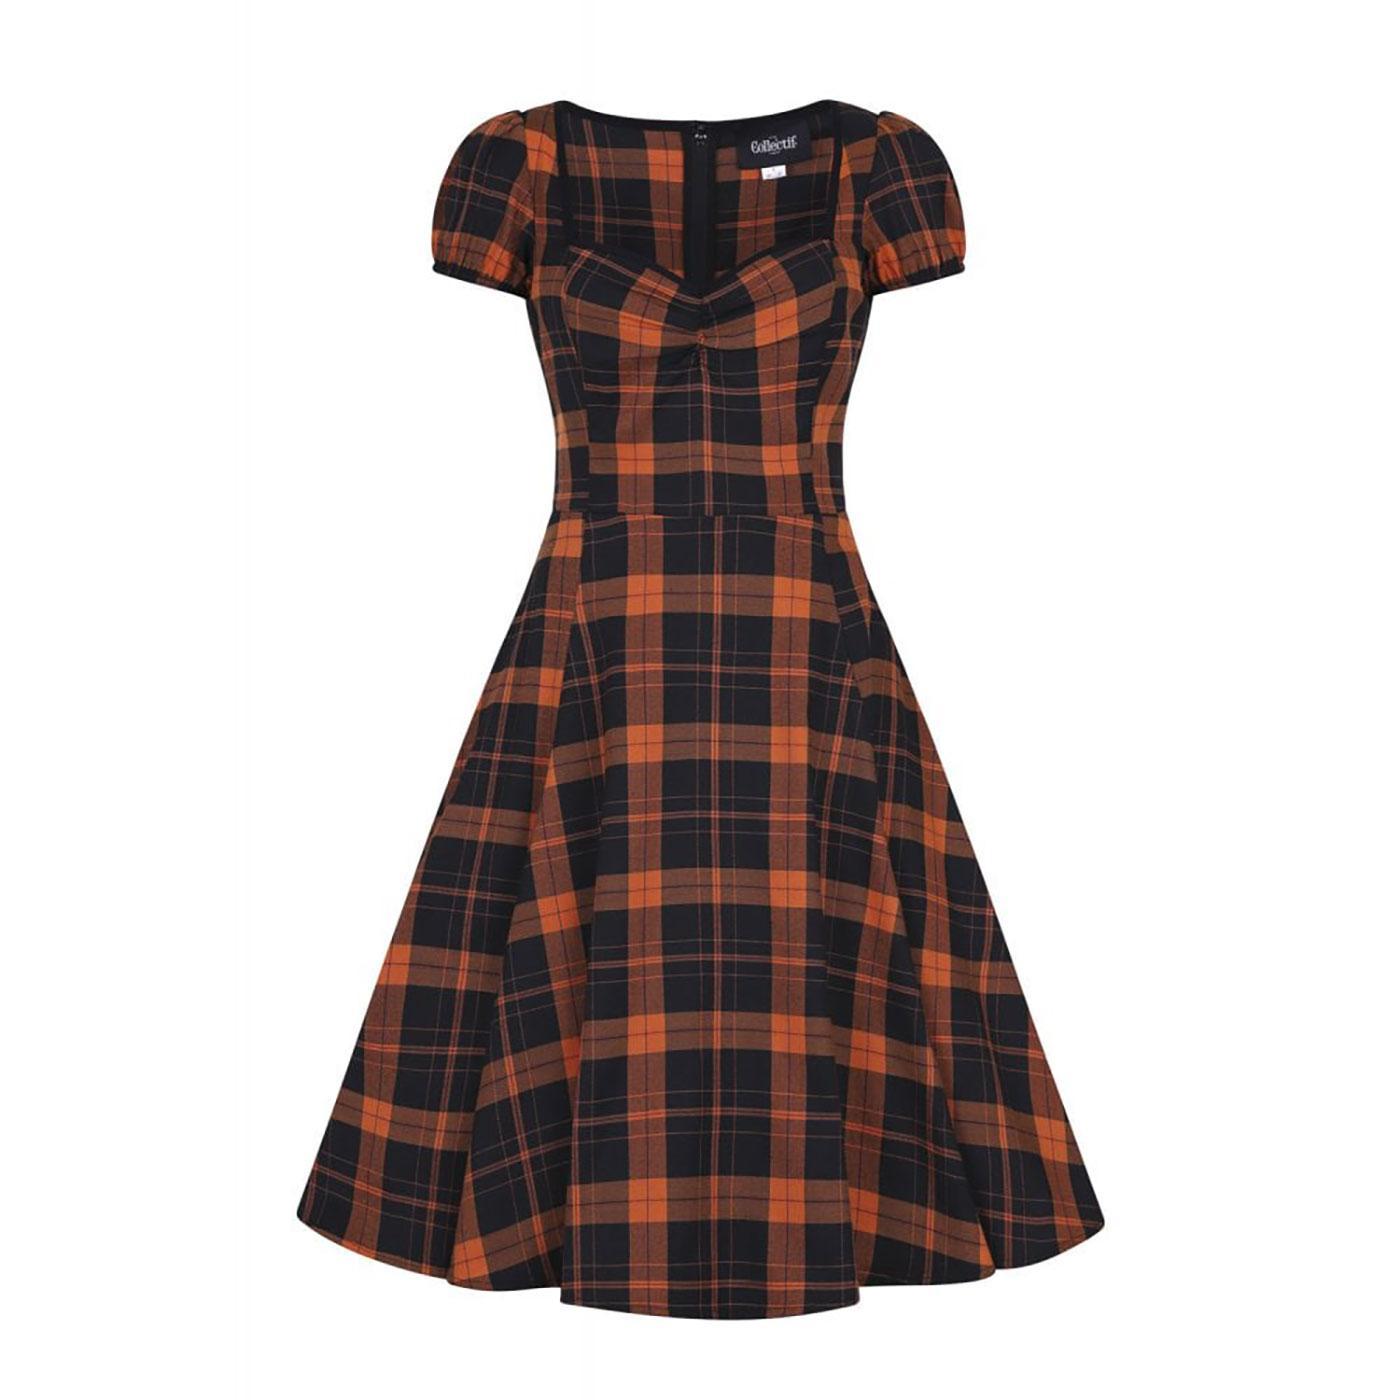 Mimi COLLECTIF Pumpkin Check Doll Dress